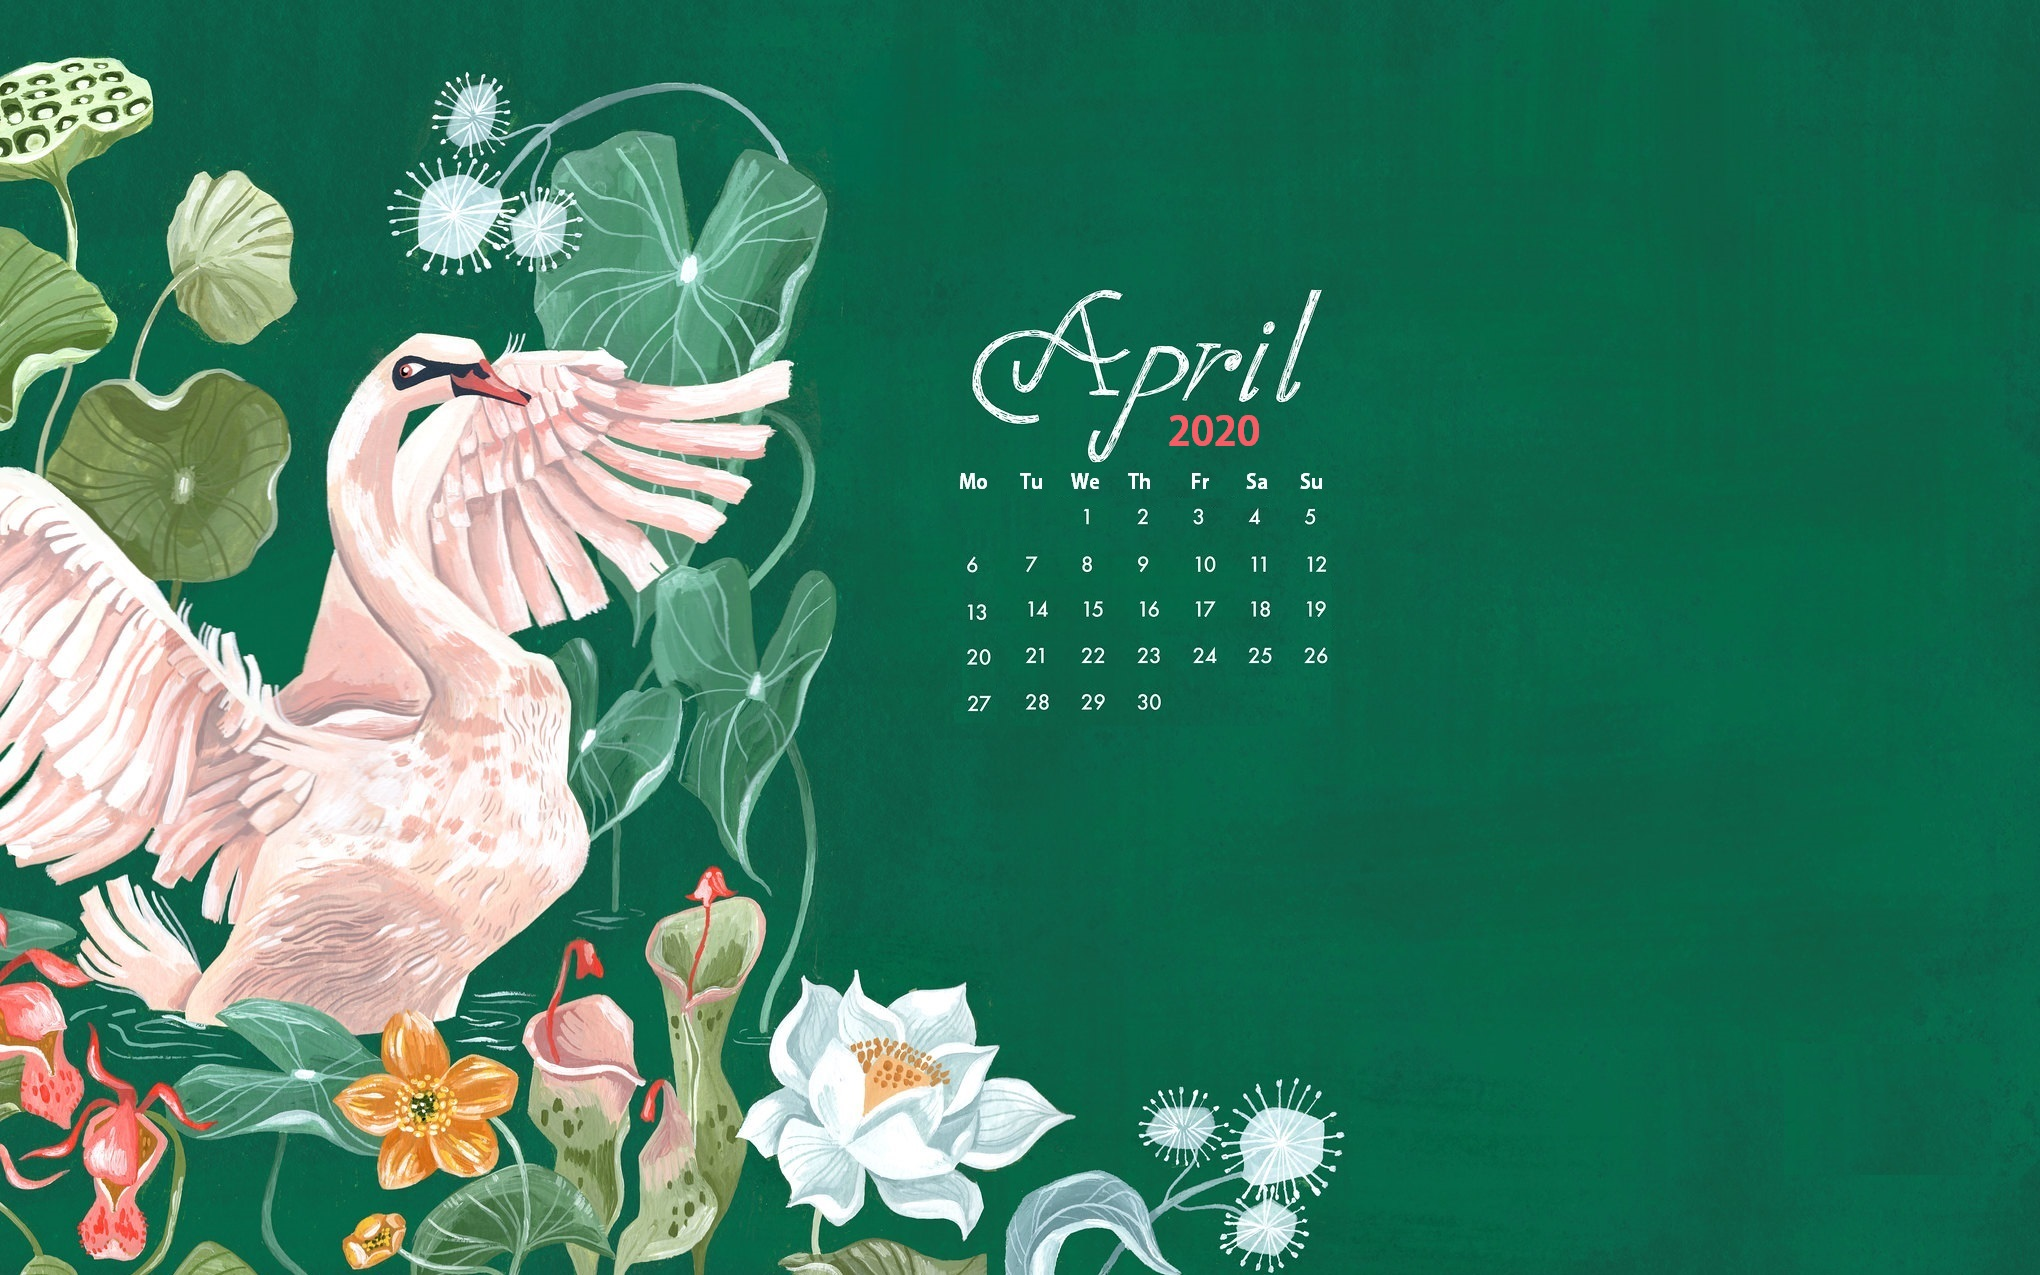 Cute April 2020 Wallpaper Calendar